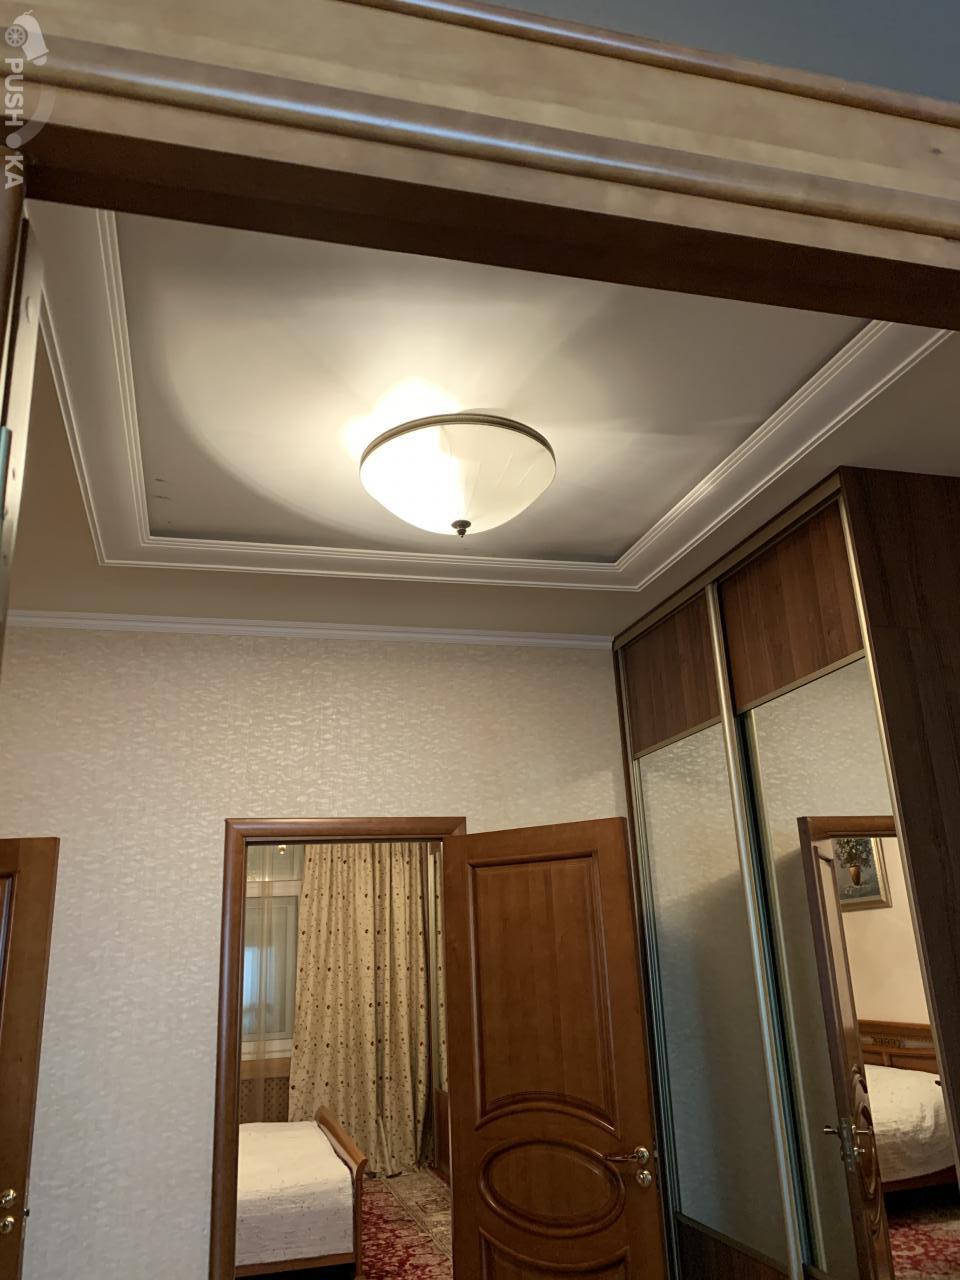 Продаётся 3-комнатная квартира 90.0 кв.м. этаж 2/10 за 29 500 000 руб